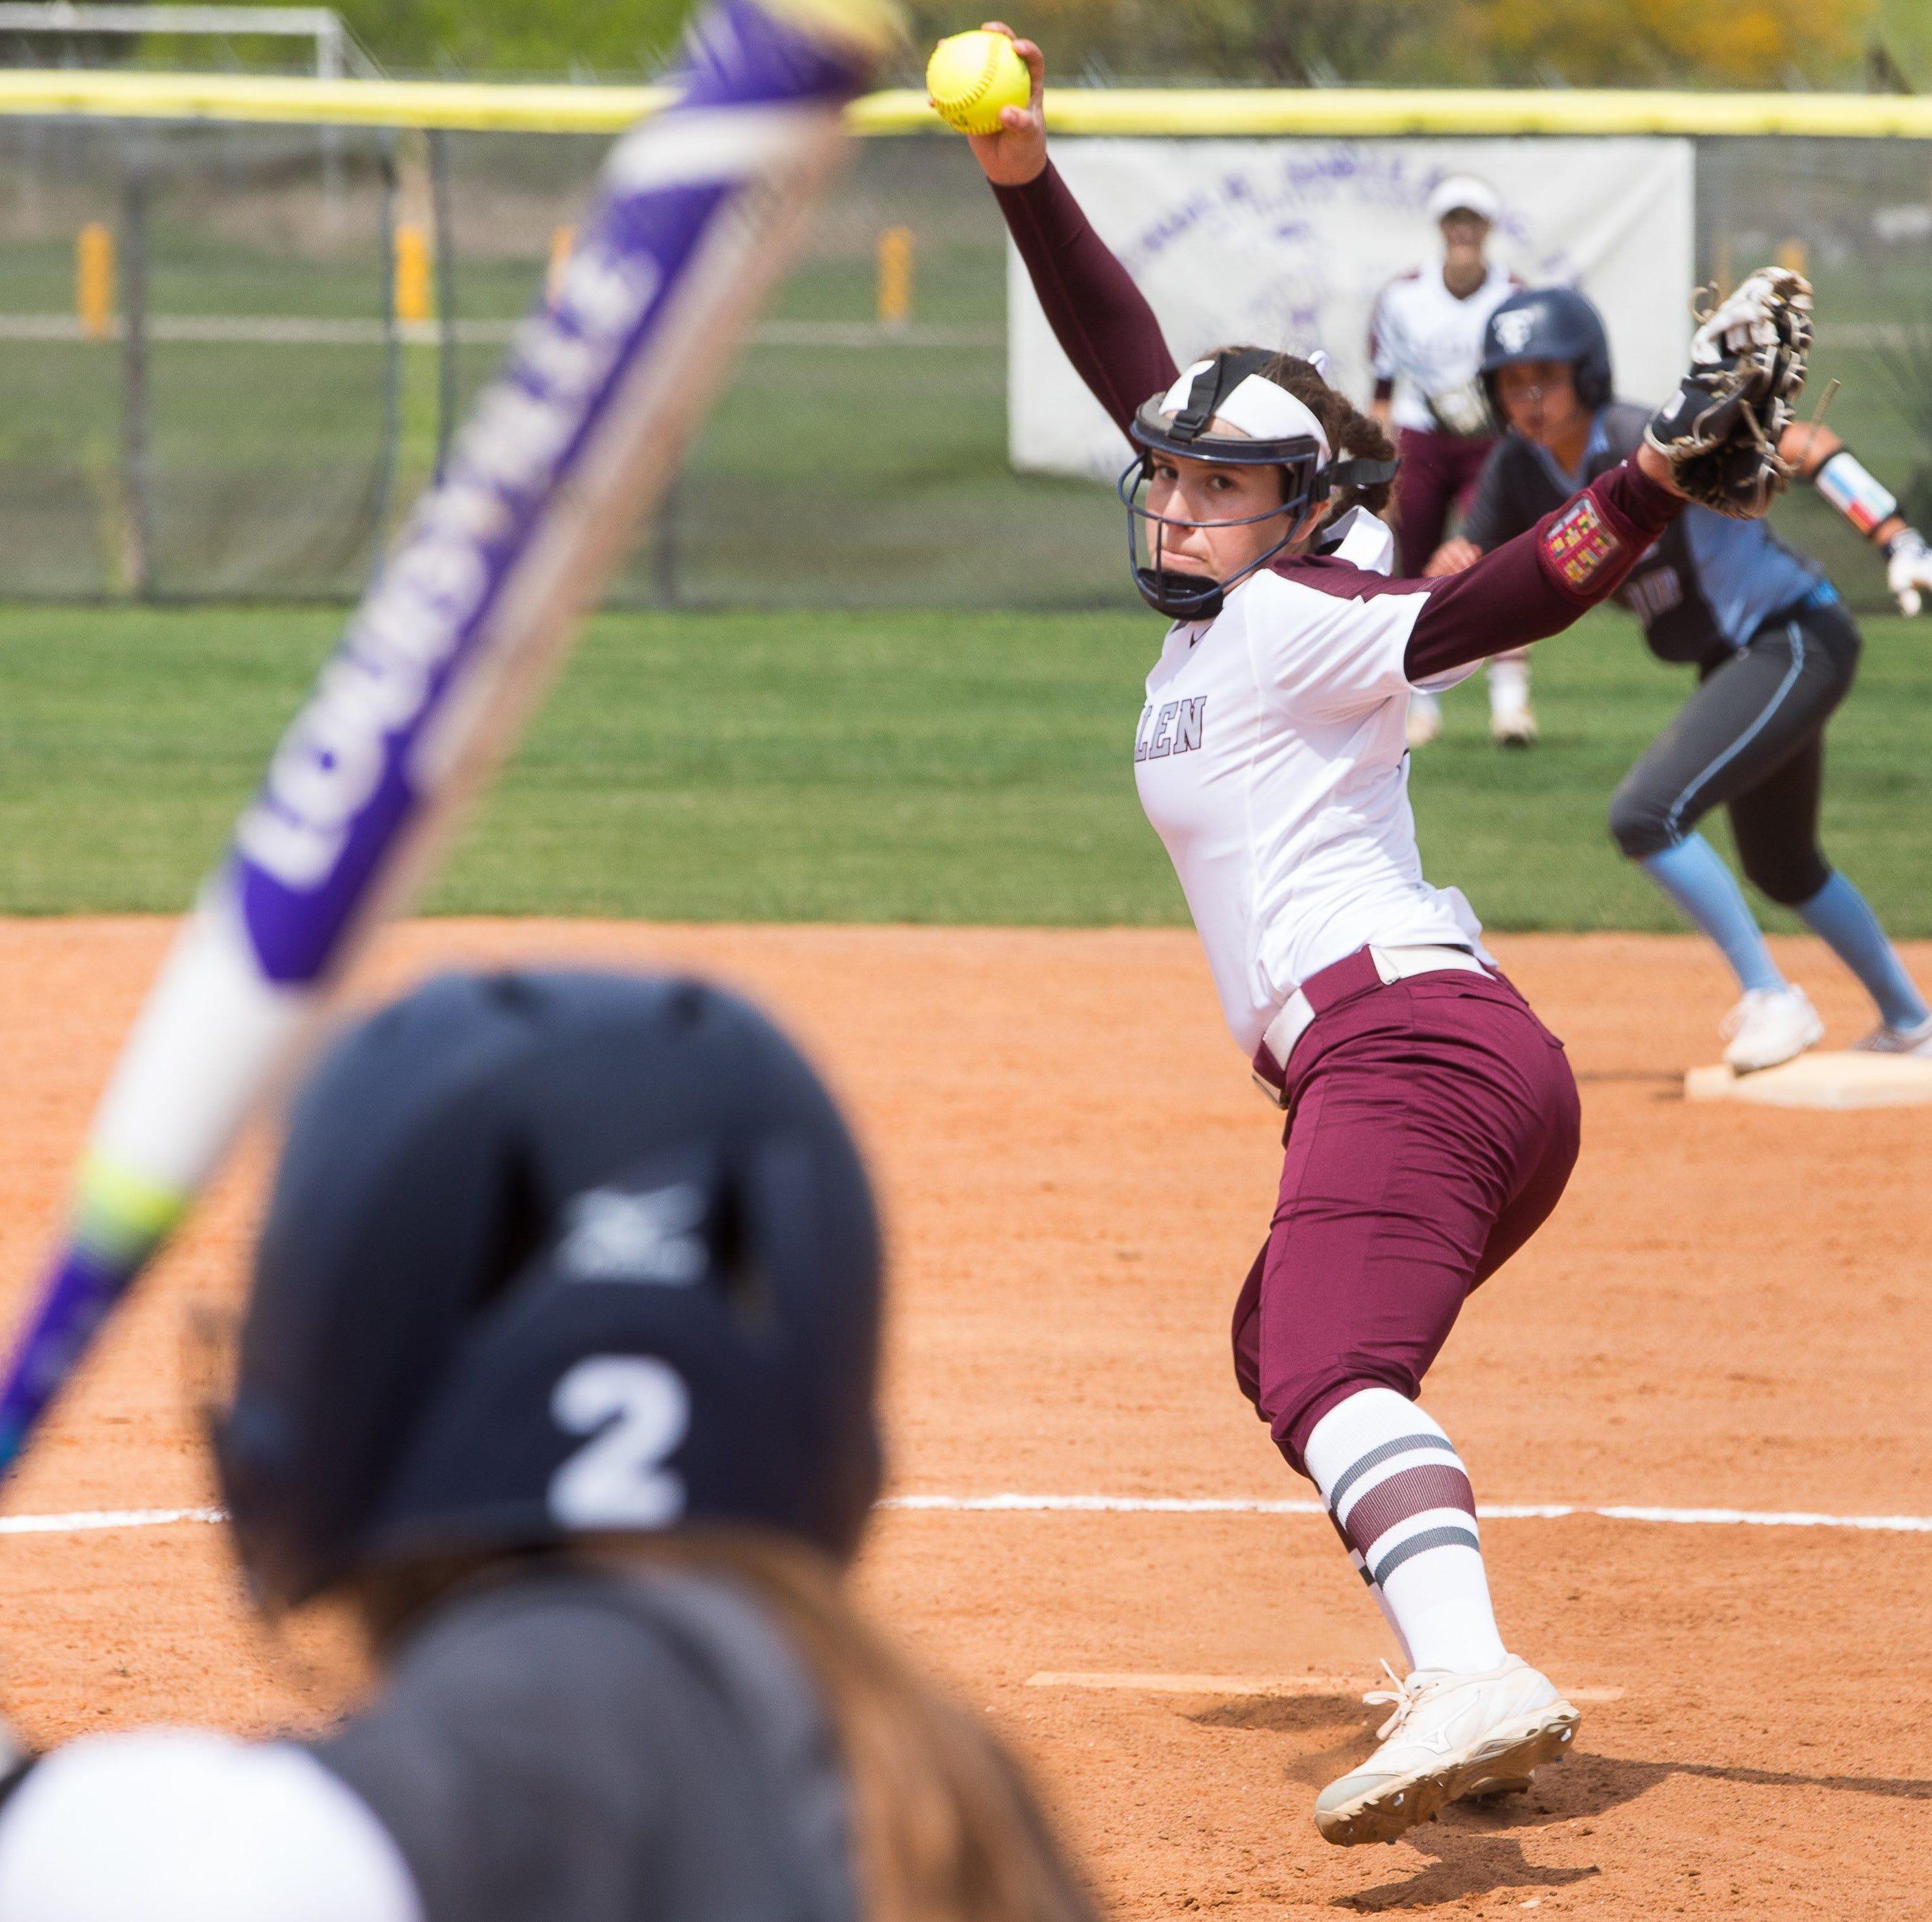 Calallen's Lizette Del Angel named Caller-Times High School Athlete of the Week